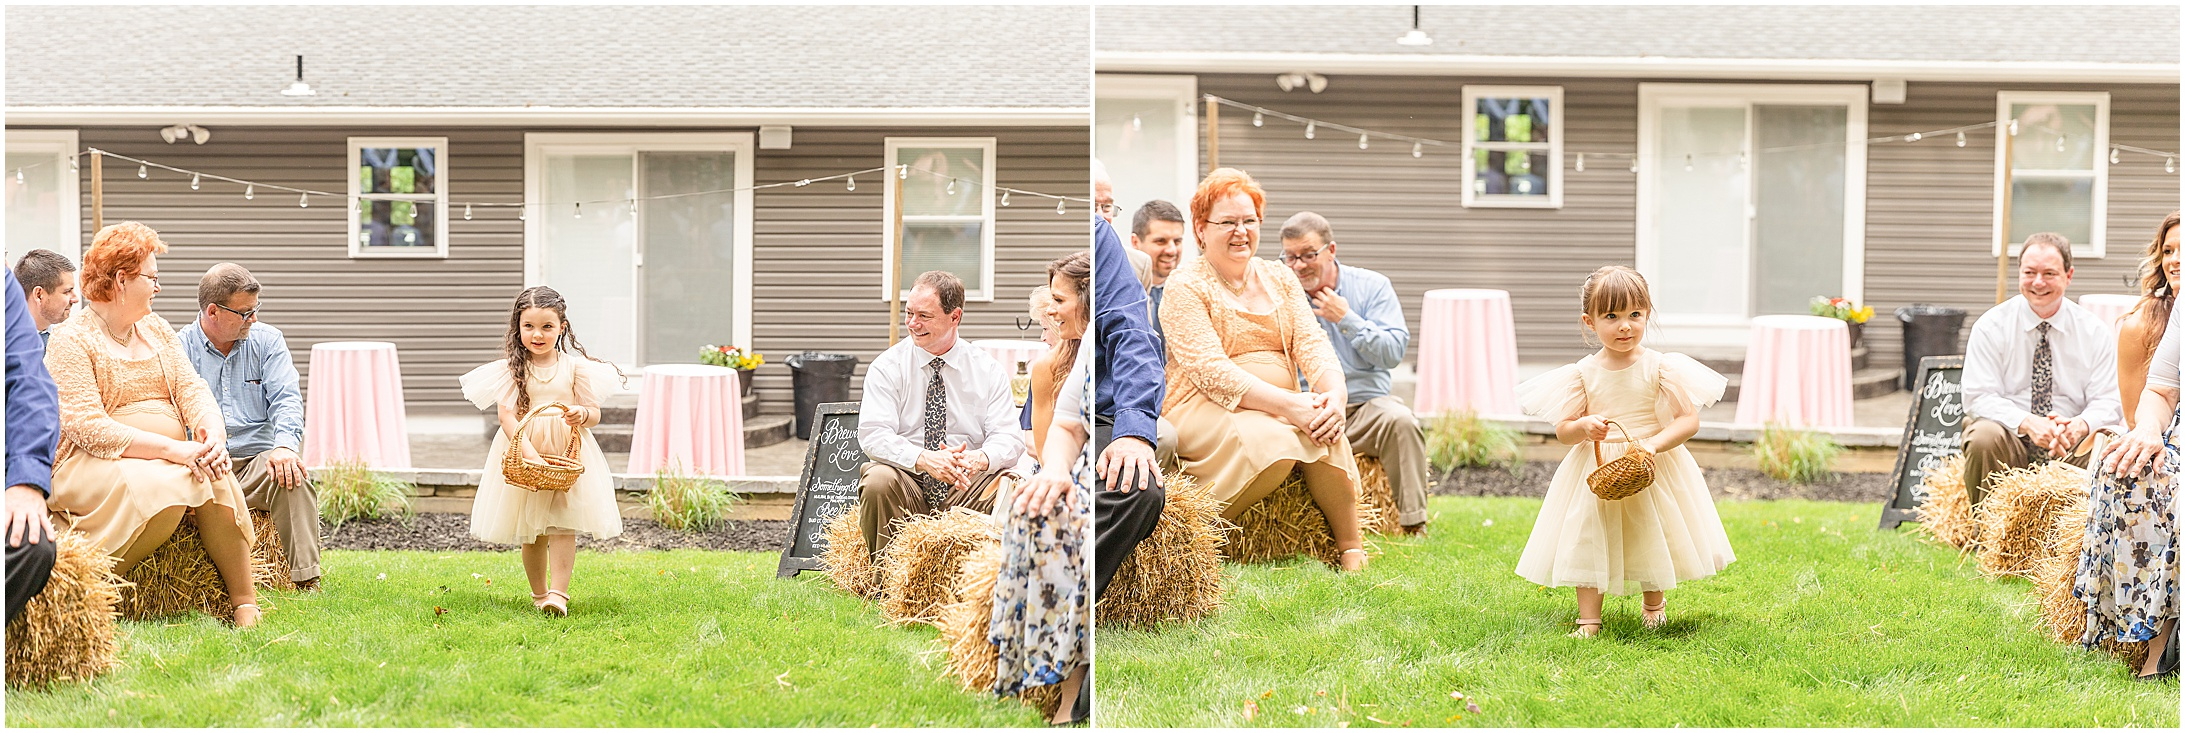 Maryland-Wedding-Photographer_0209.jpg